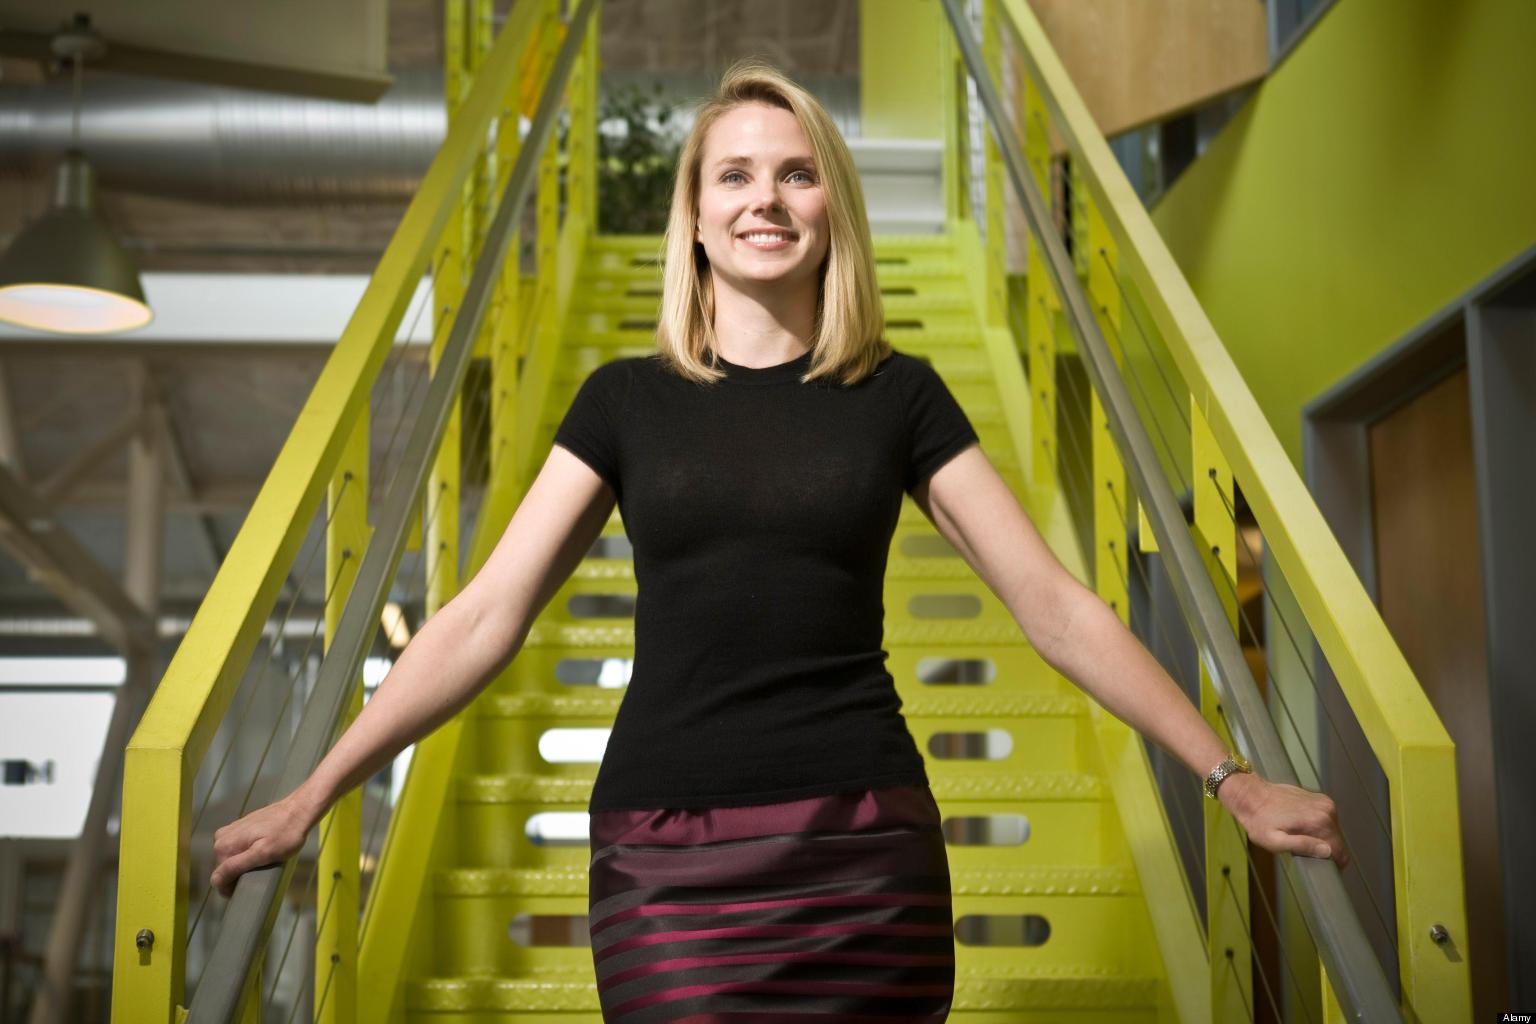 Marissa Mayer and Yahoo Layoffs